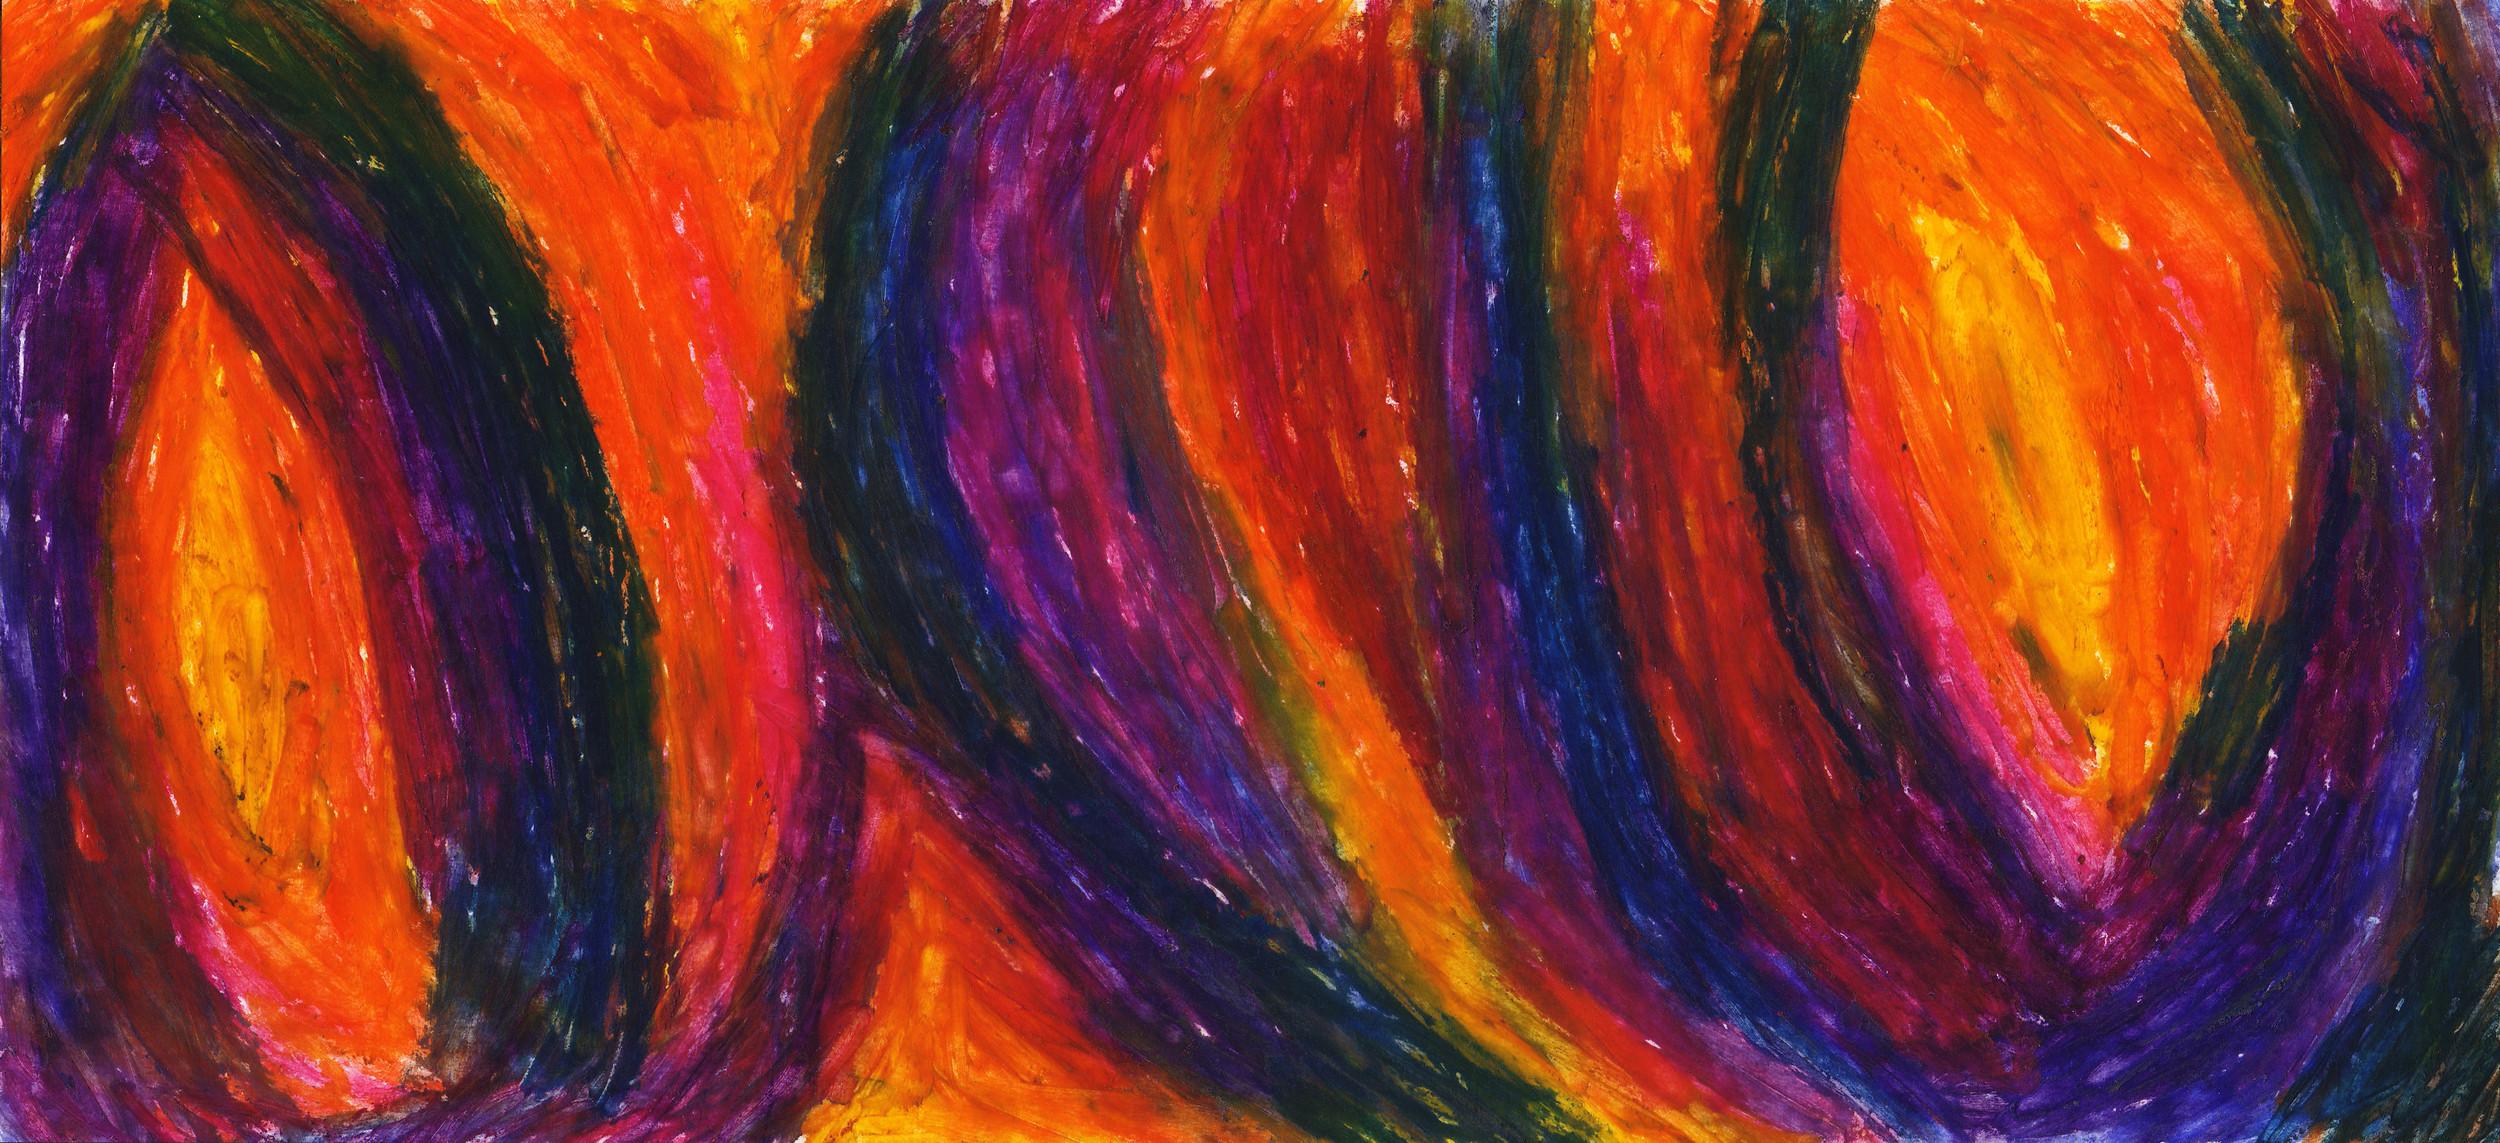 The Divine Fire , 2010, Oil Pastel, 4.35 x 9.65 in